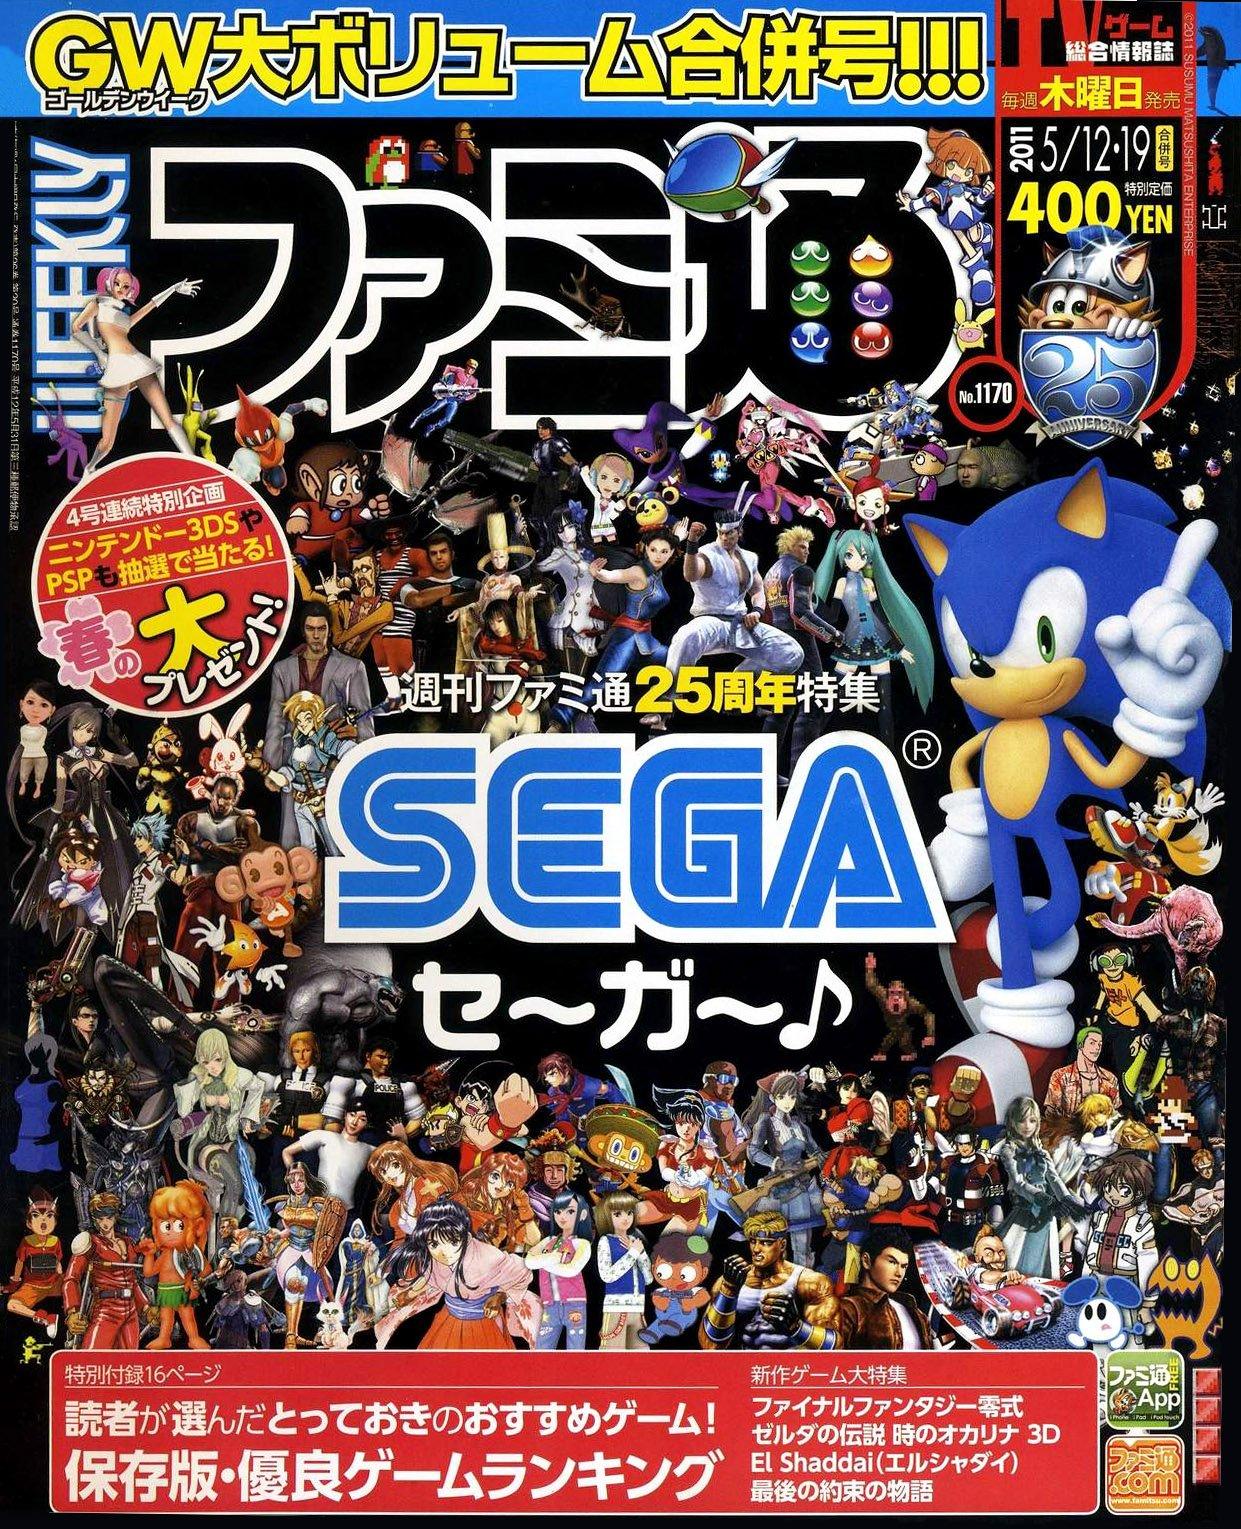 Famitsu 1169/1170 (May 12/19, 2011)